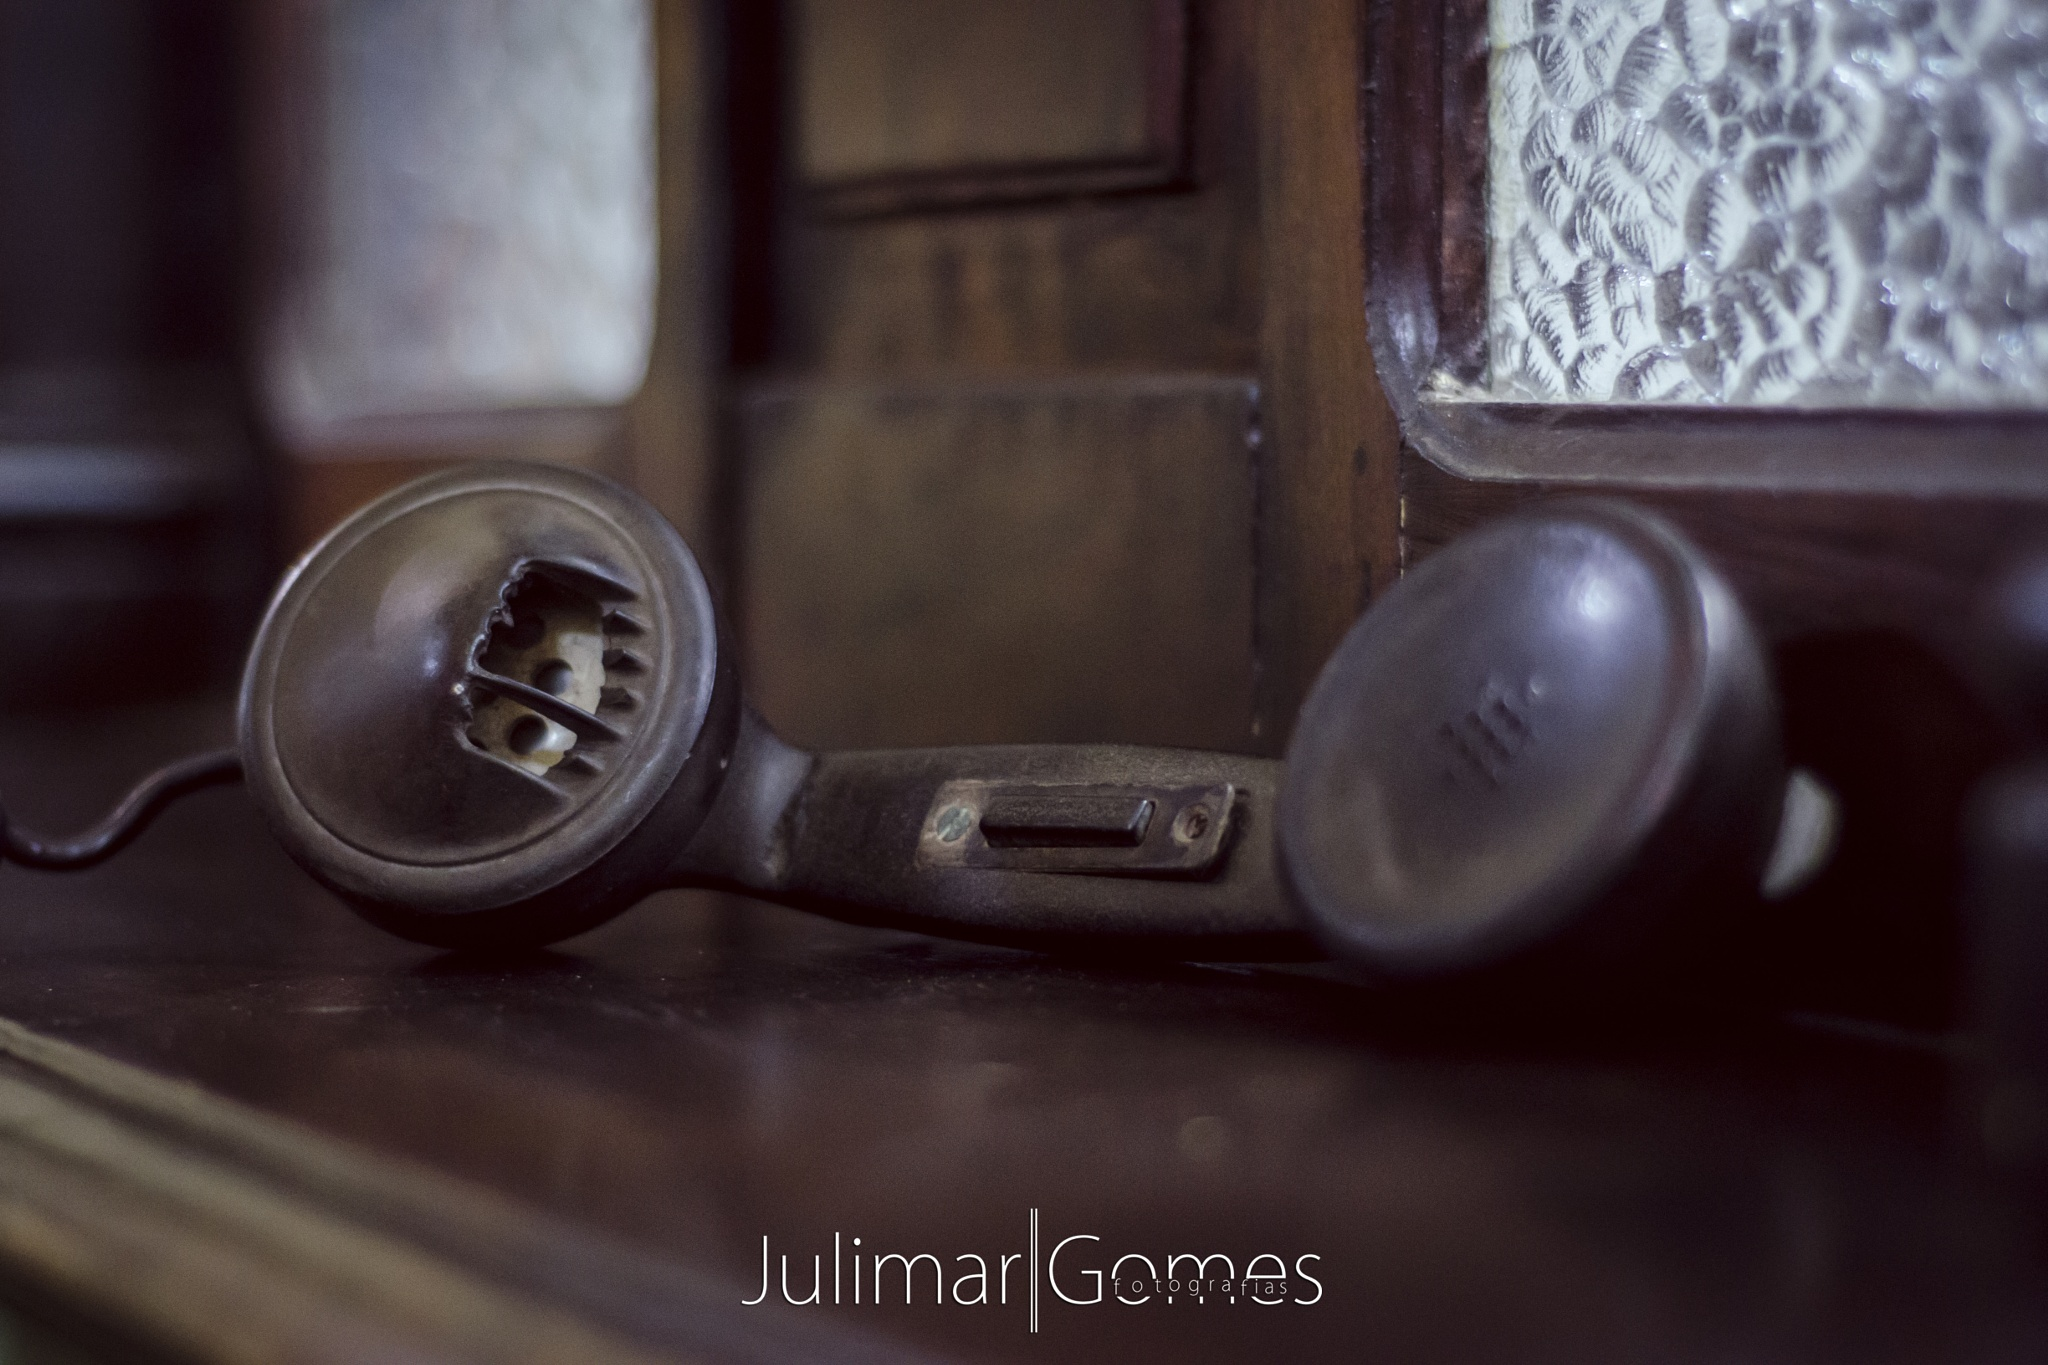 Telefone Mudo by Julimar Gomes